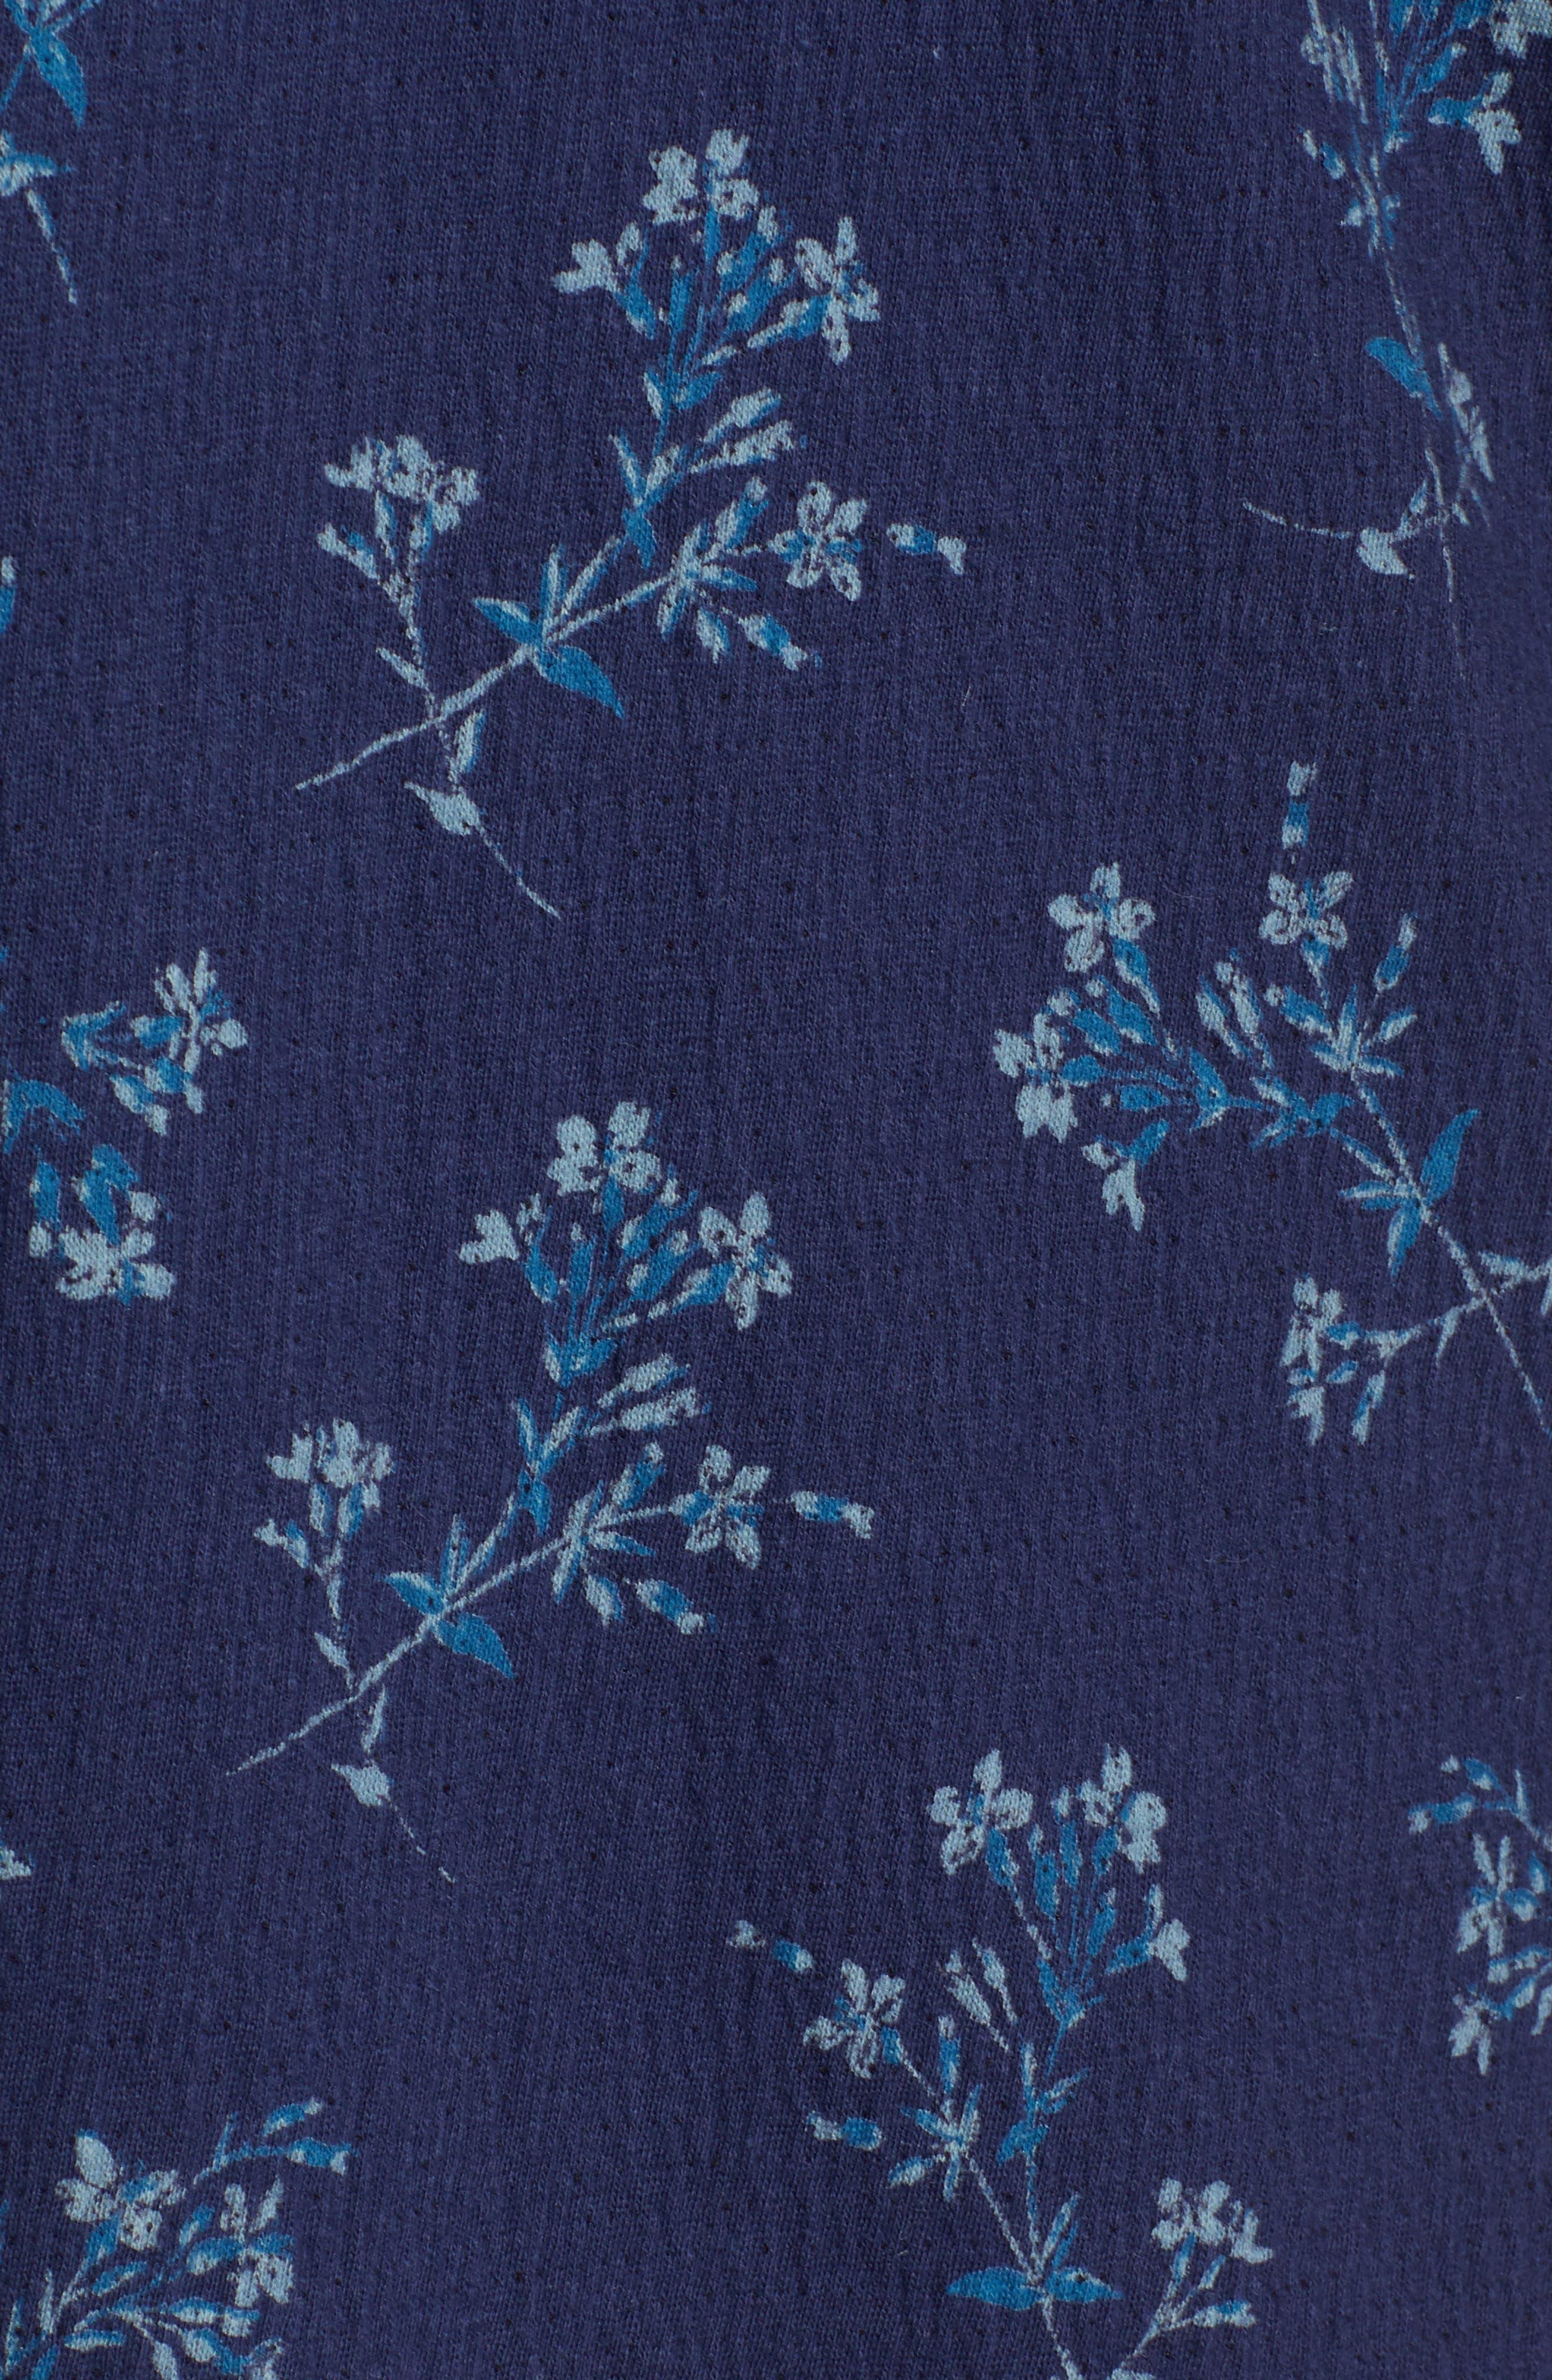 Tiered Sleeve Mini Dress,                             Alternate thumbnail 5, color,                             400